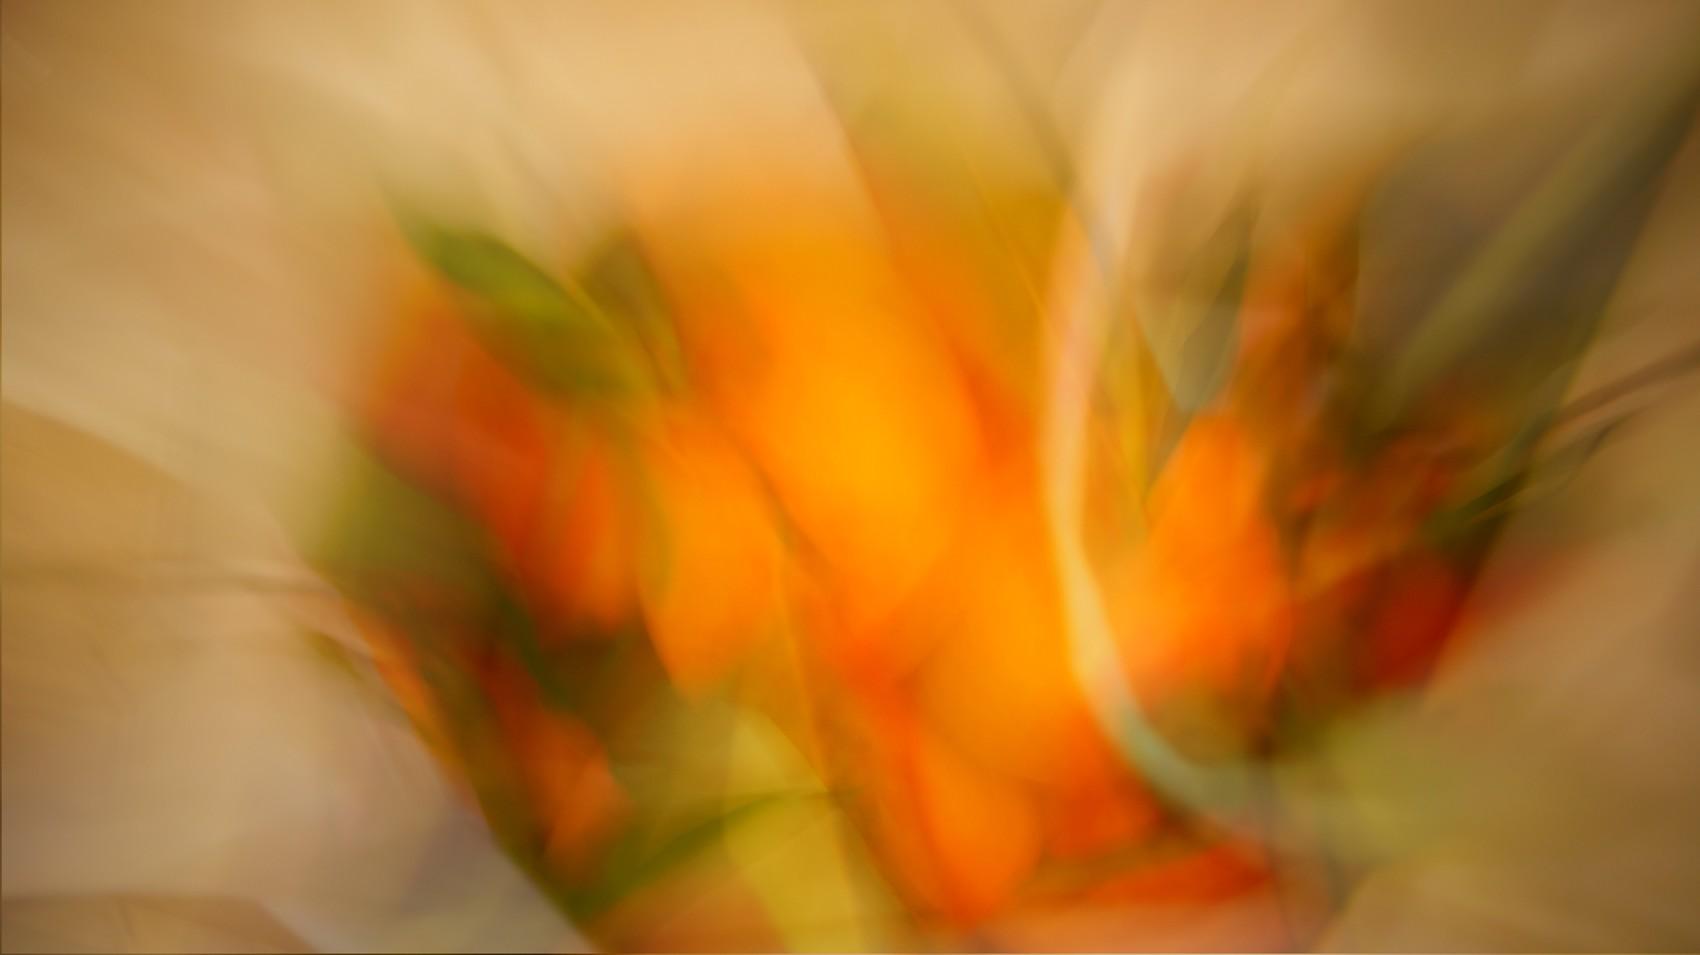 Les mandarines